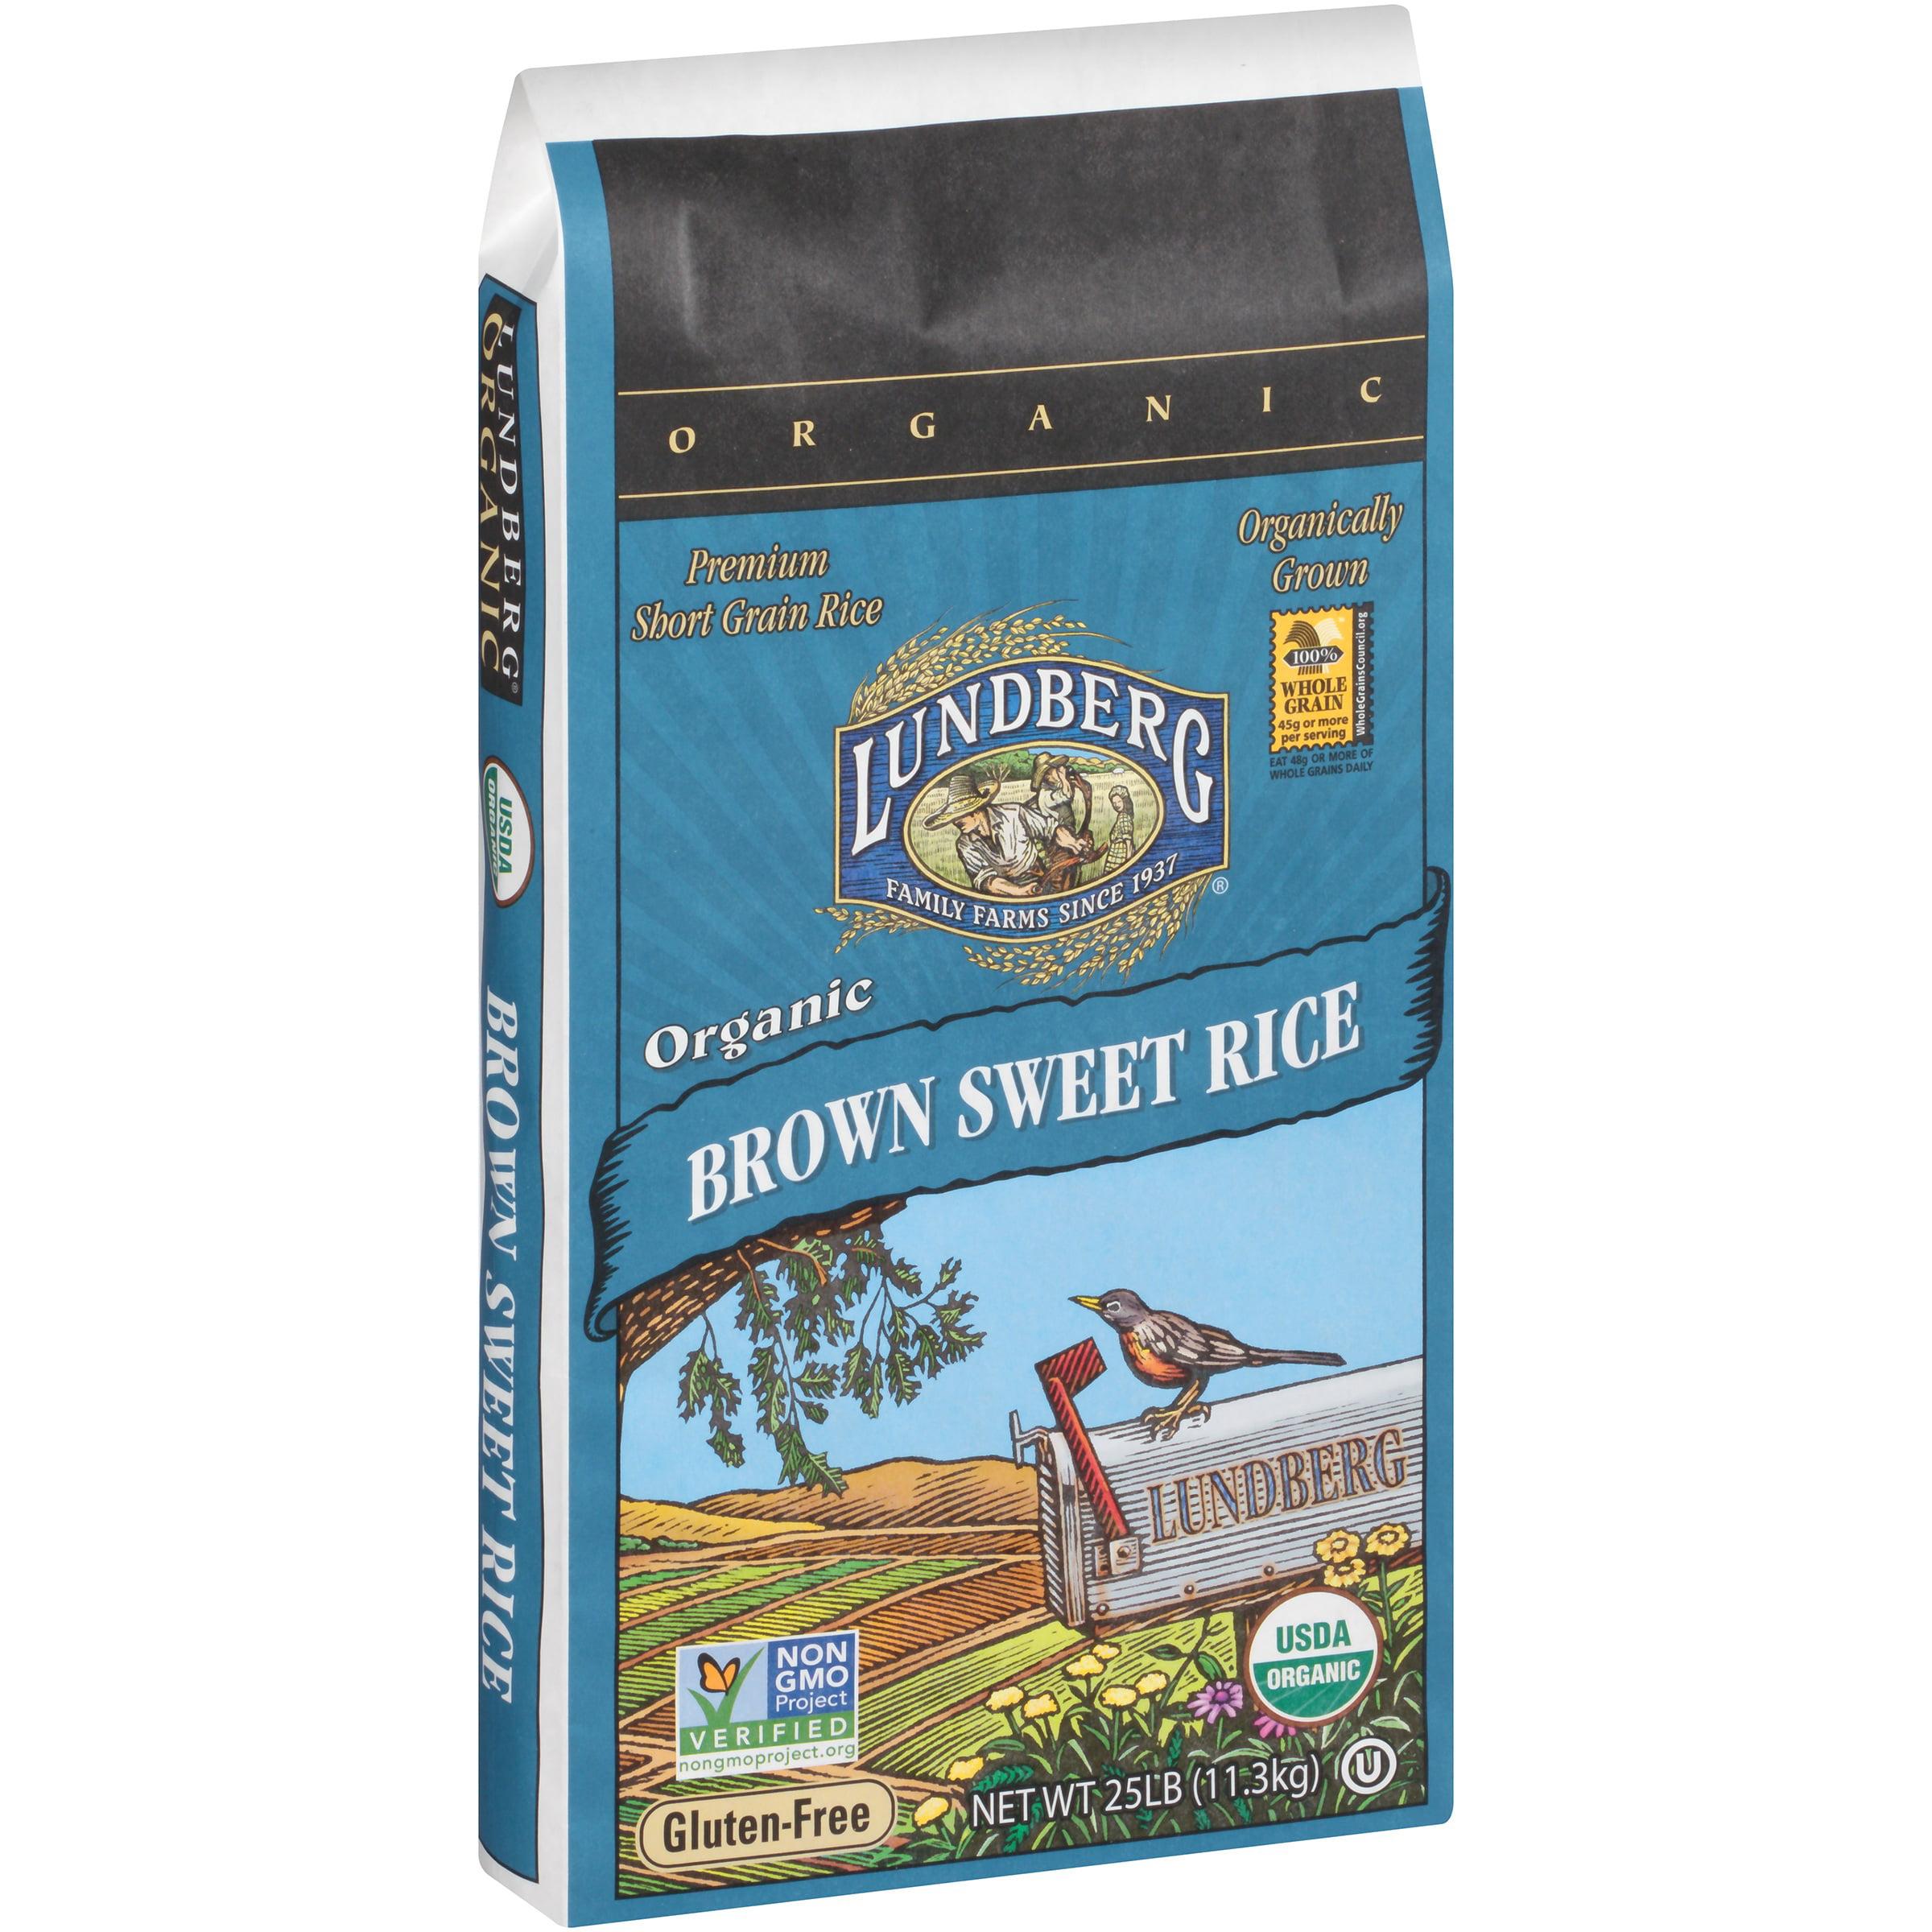 Lundberg Organic Brown Sweet Rice 25 lb. Bag